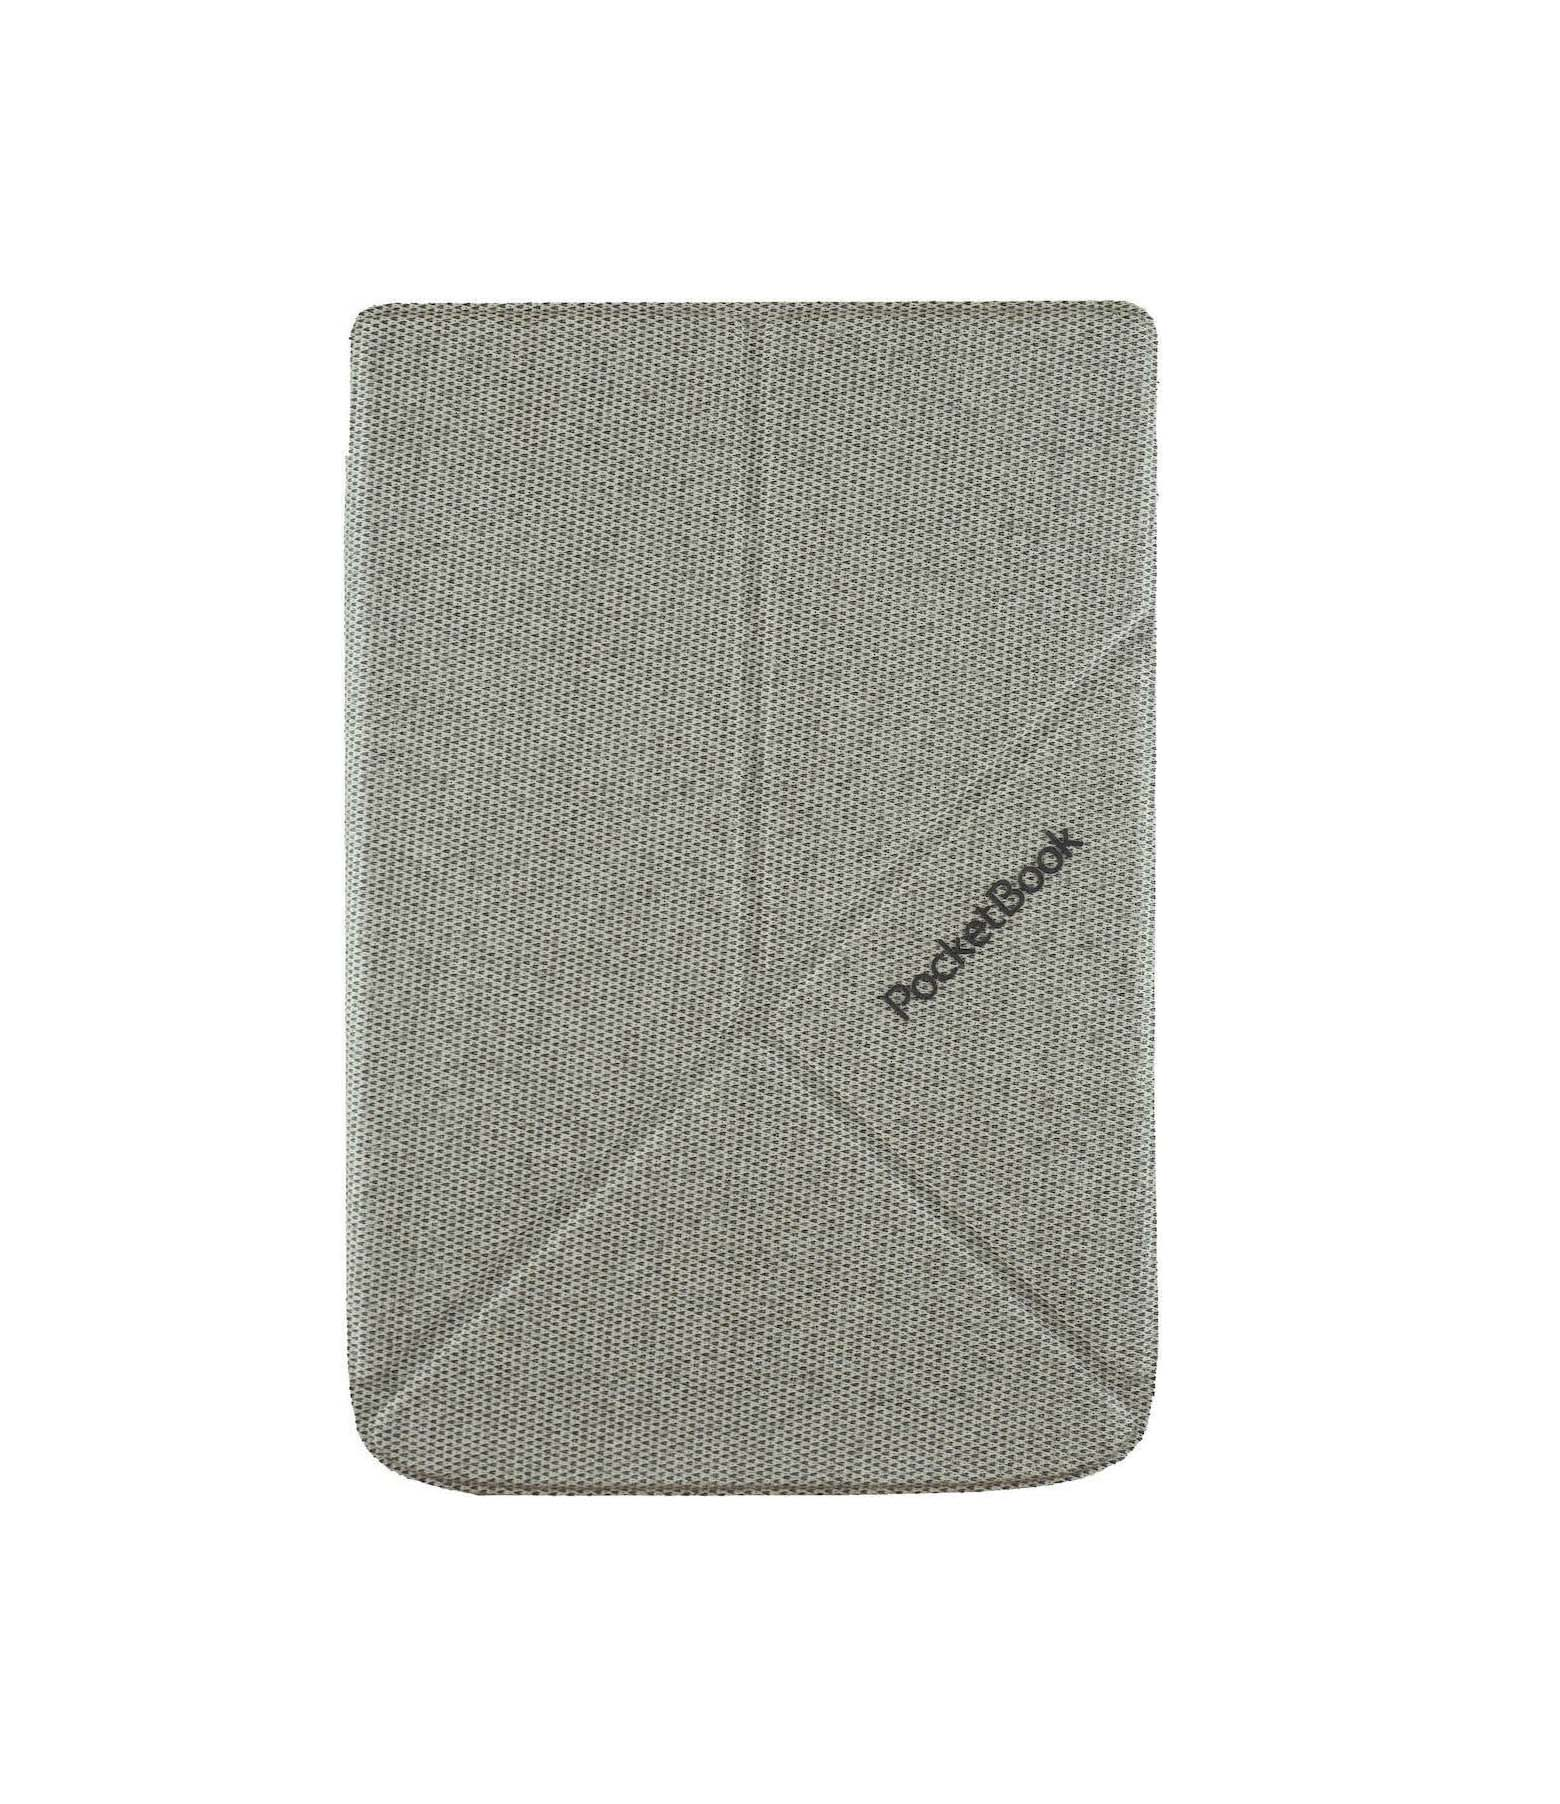 Pocketbook Origami Case Sleeve Light Grey (Touch Lux, Color, Basic 4) HN-SLO-PU-U6XX-LG-WW